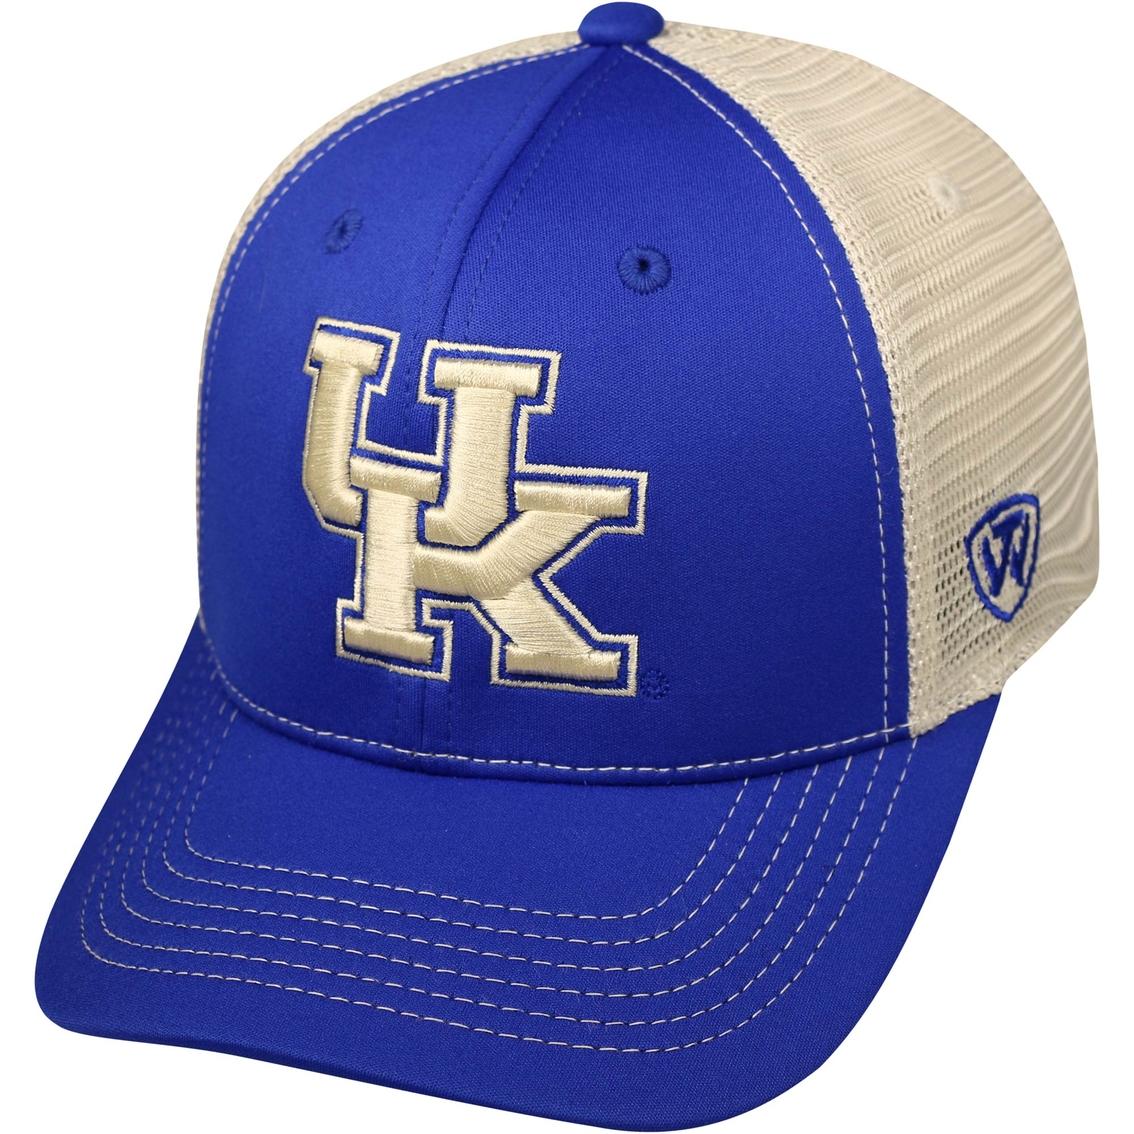 best sneakers 2d648 9a0c5 Top of the World NCAA Kentucky Wildcats Ranger Adjustable Two Tone Cap